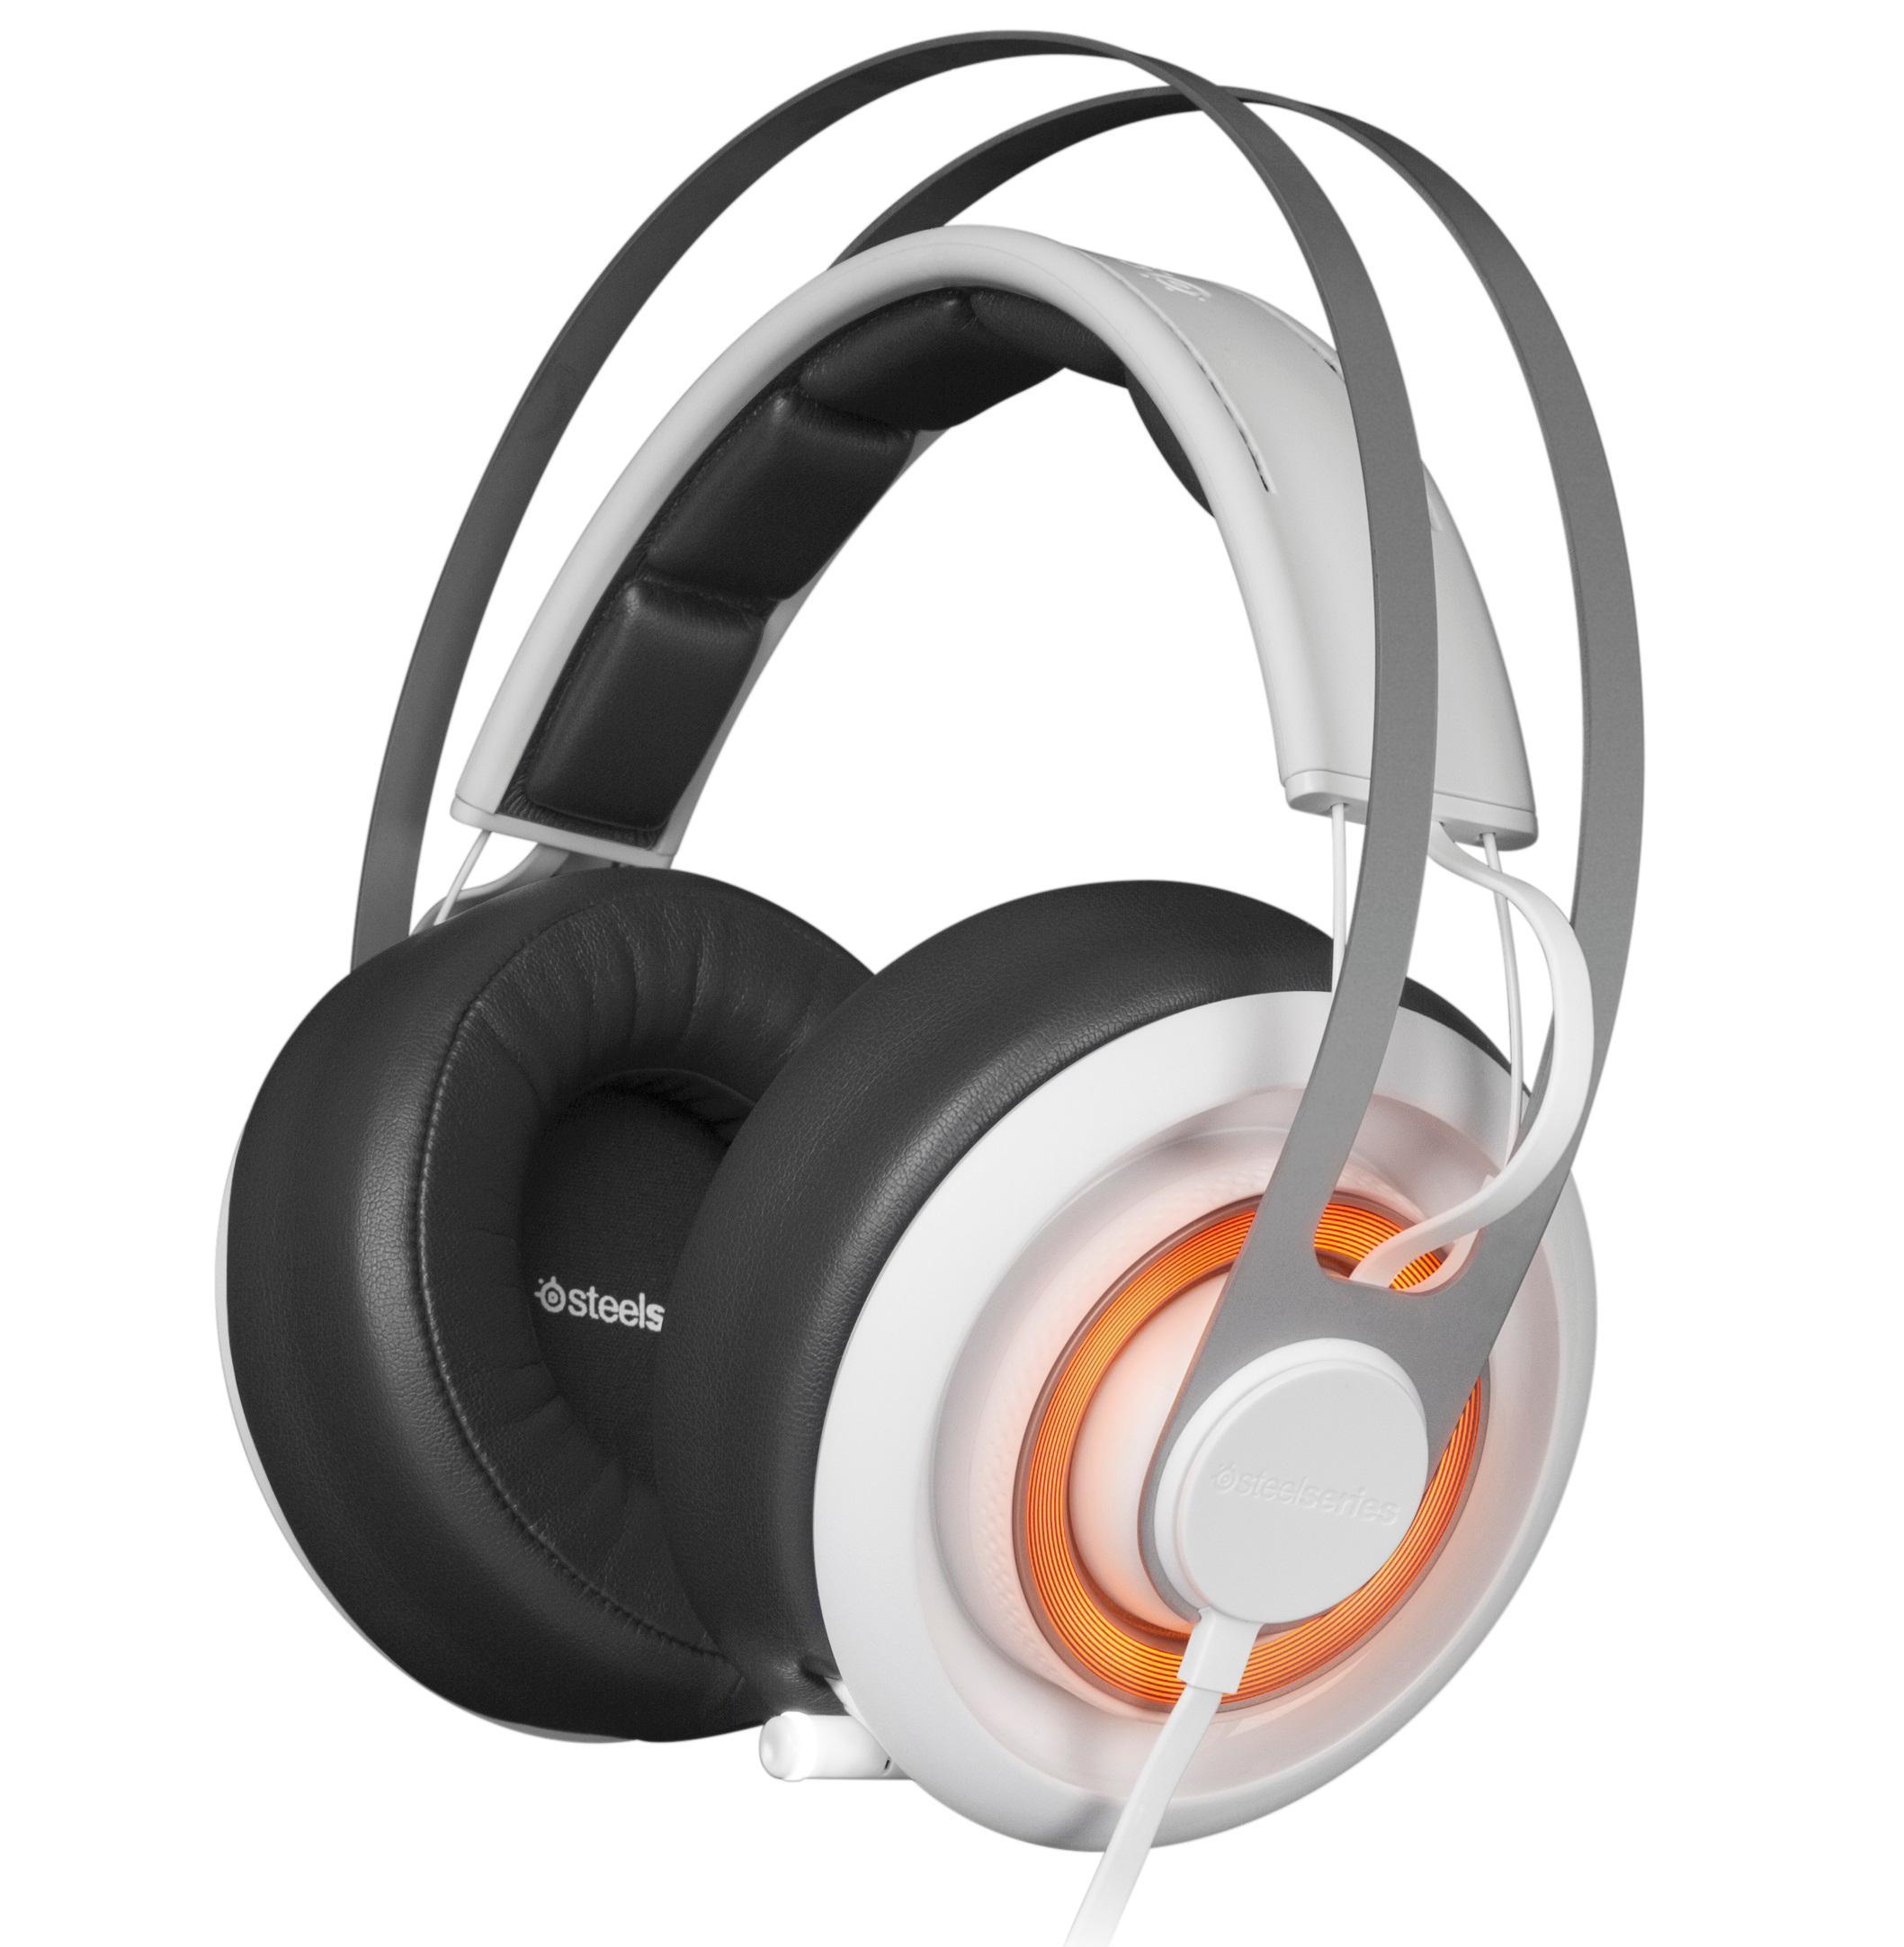 8c2f447b87b SteelSeries Siberia Elite Prism Gaming Headset-Artic White: Amazon ...